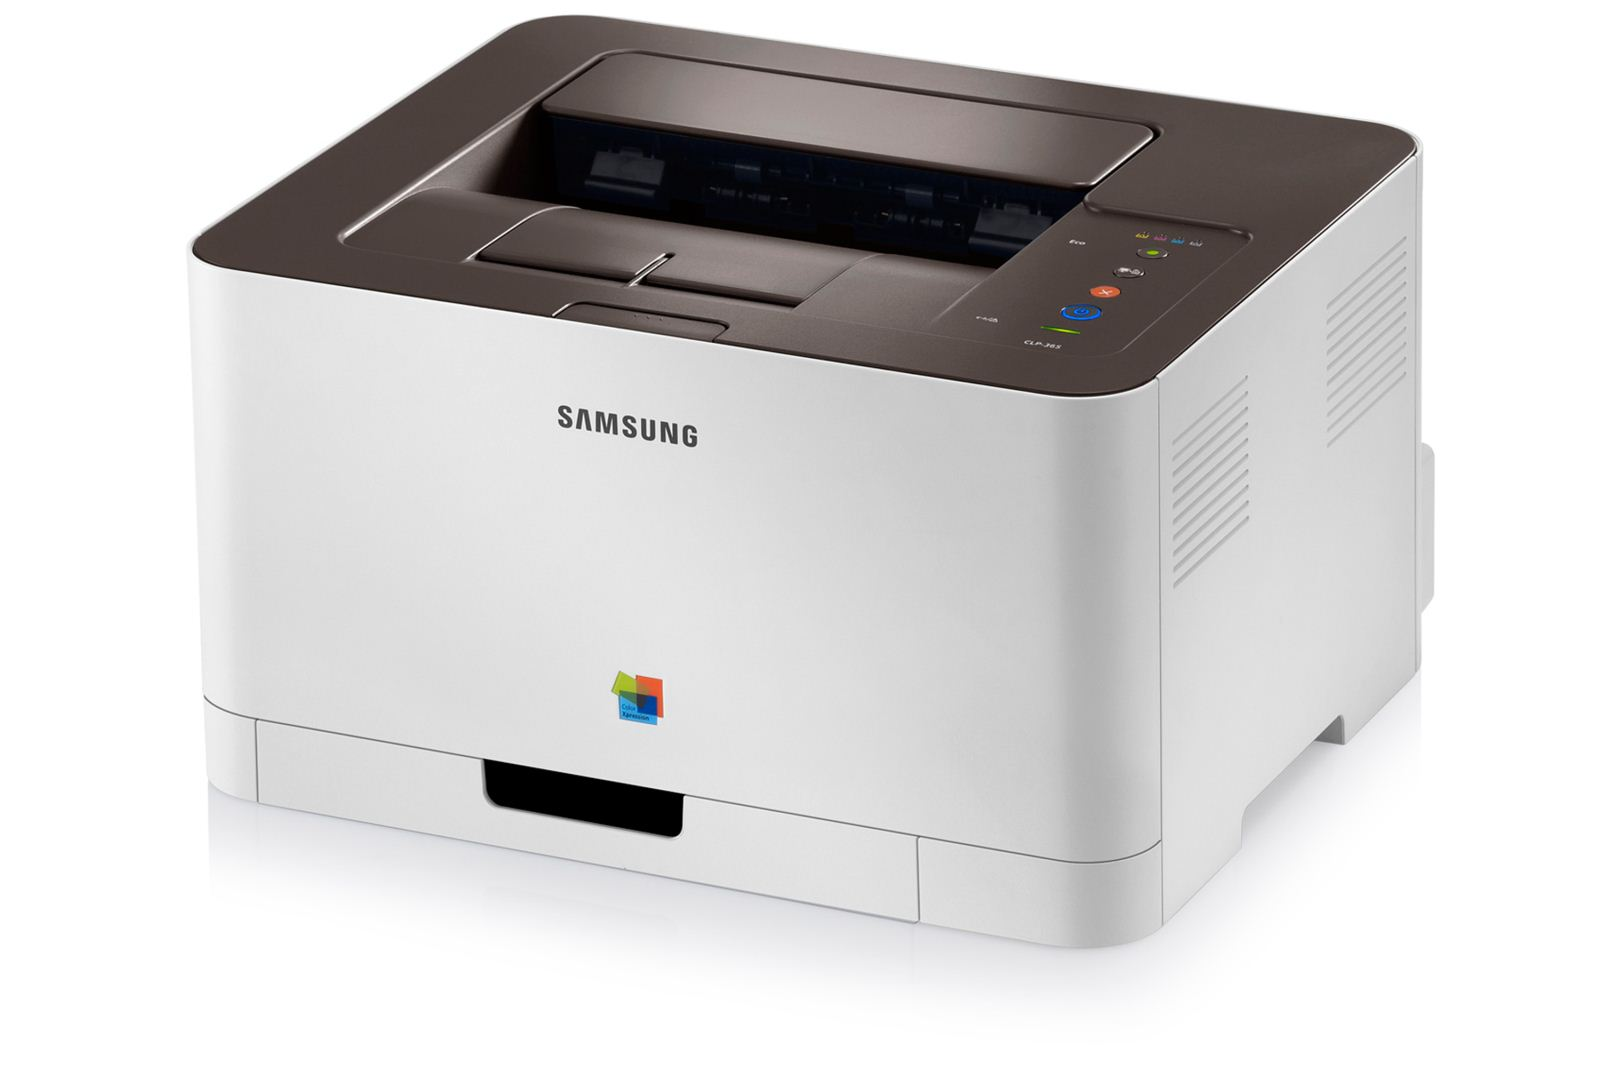 Máy in Samsung CLP365w, Wifi, Laser màu